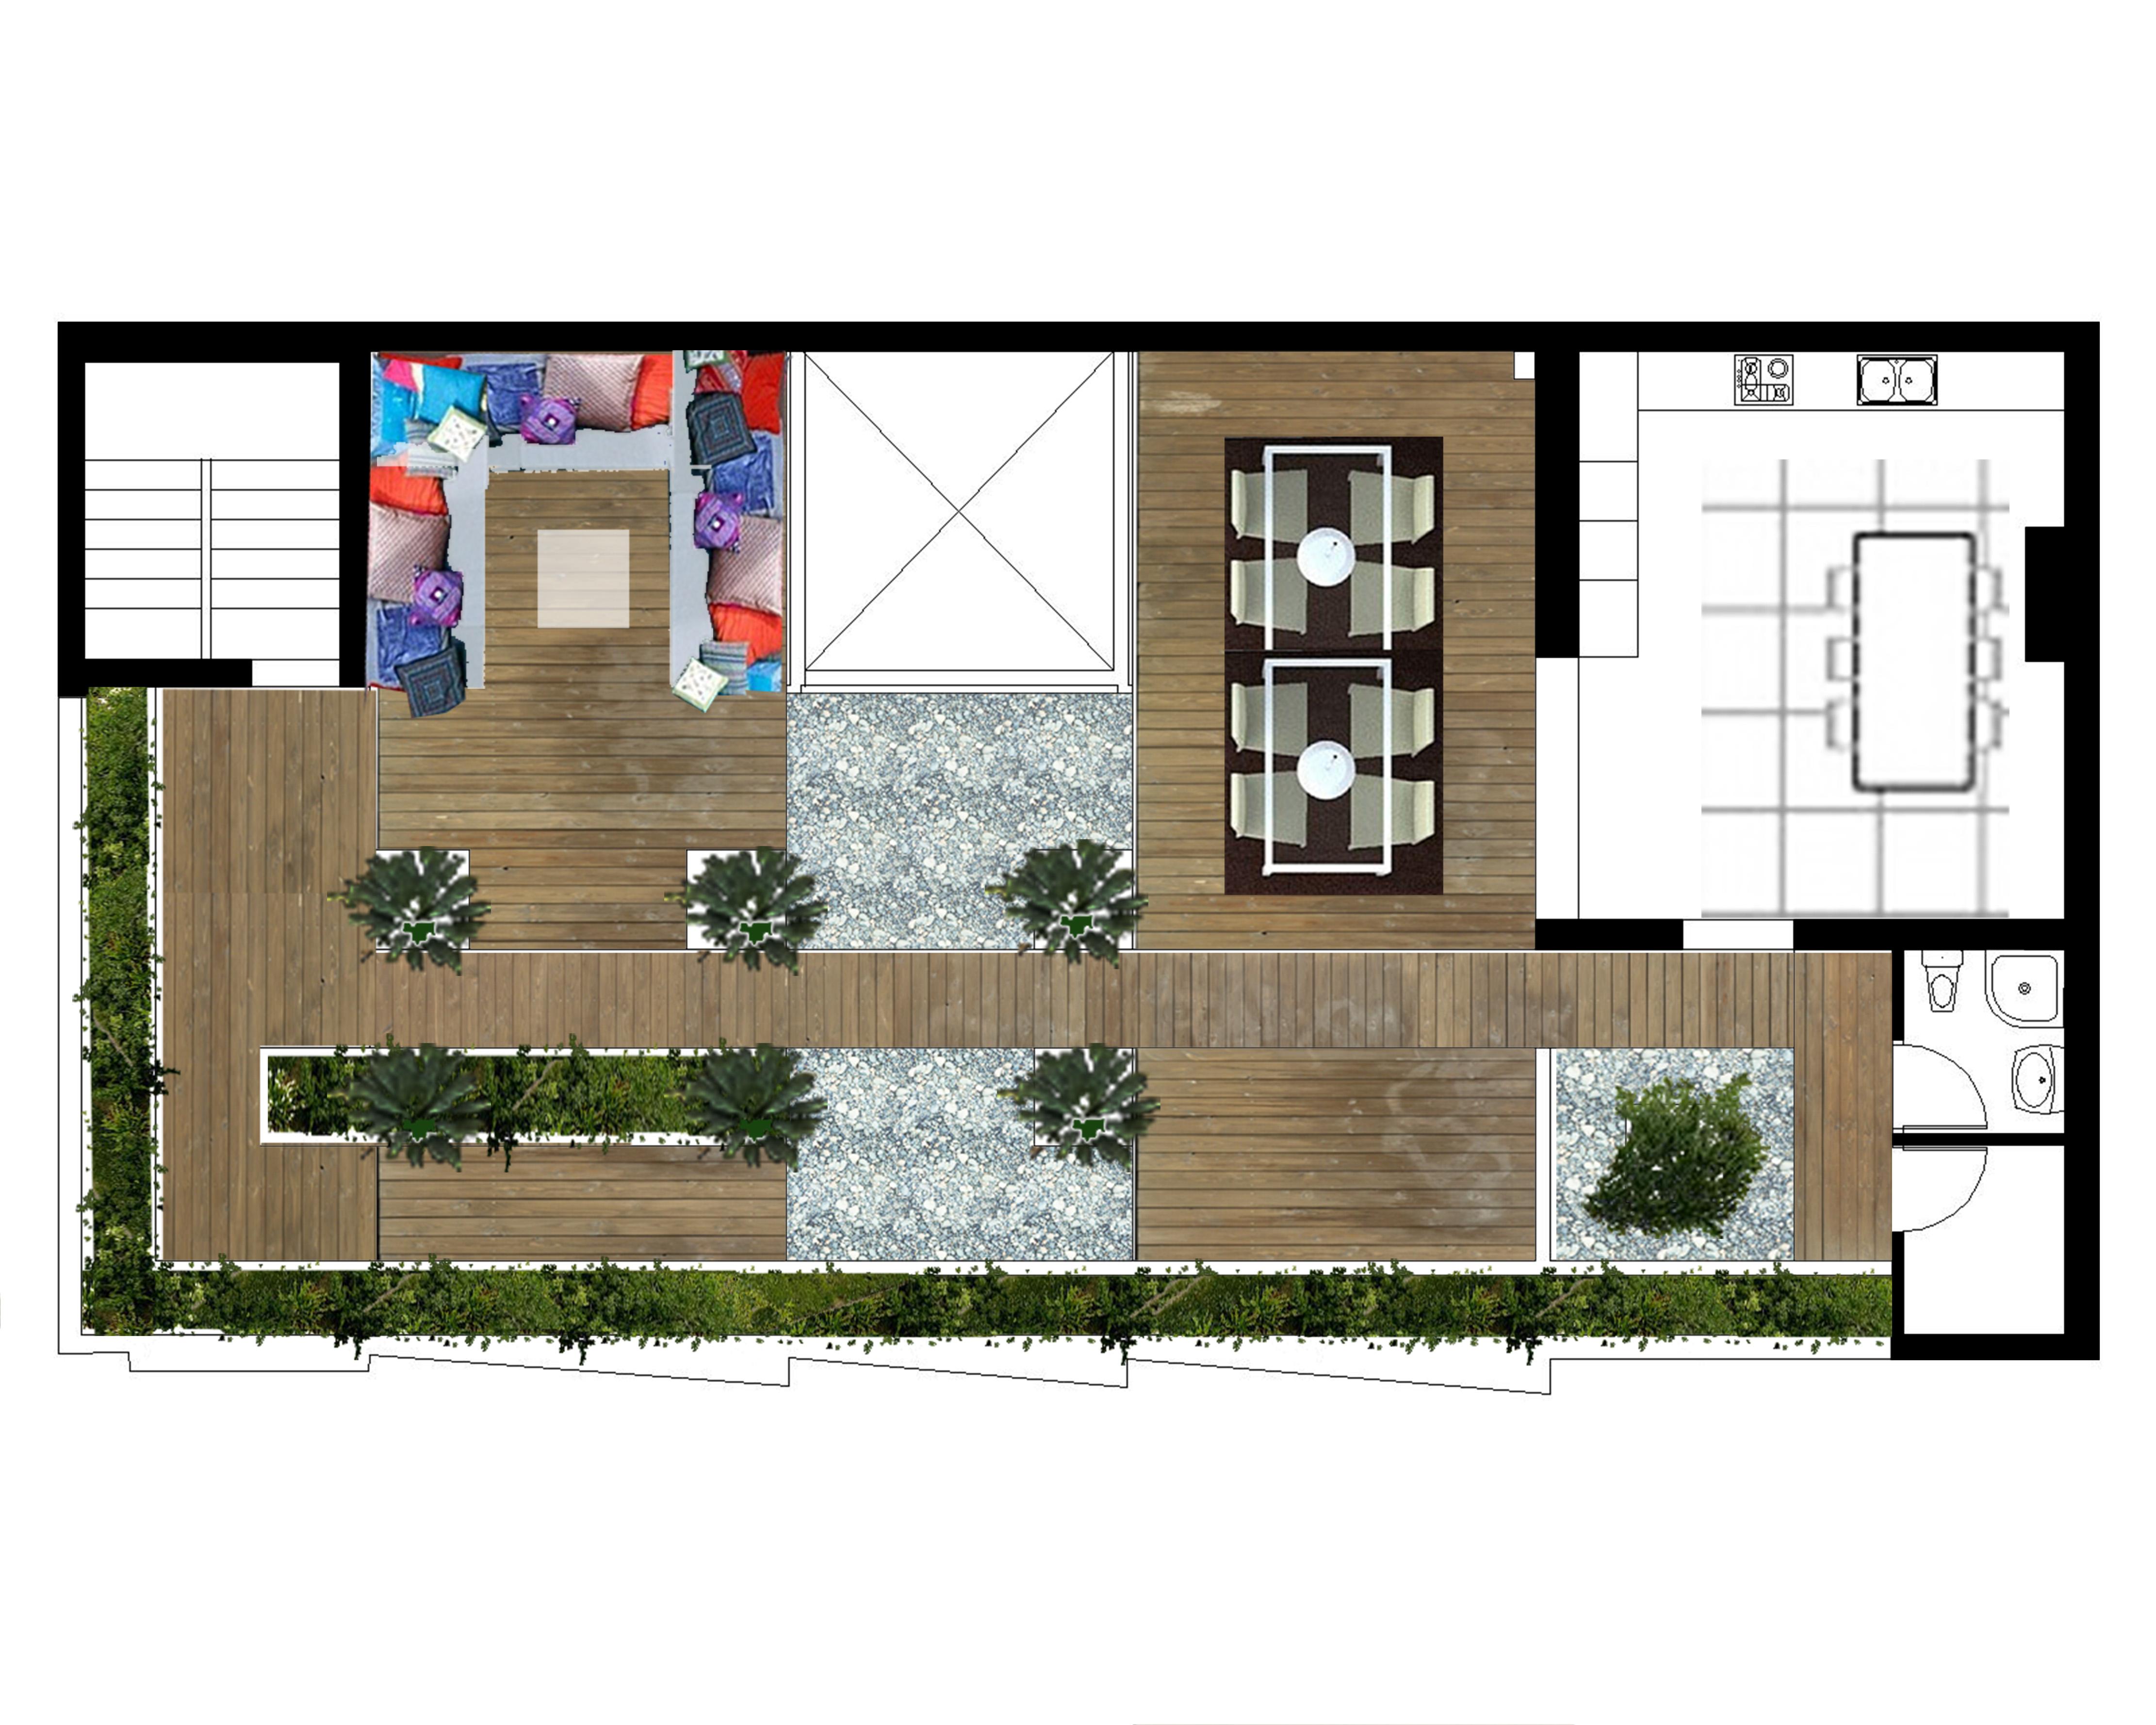 Terrazas studio3 arquitectura paisaje dise o - Plantas para terrazas con mucho sol ...